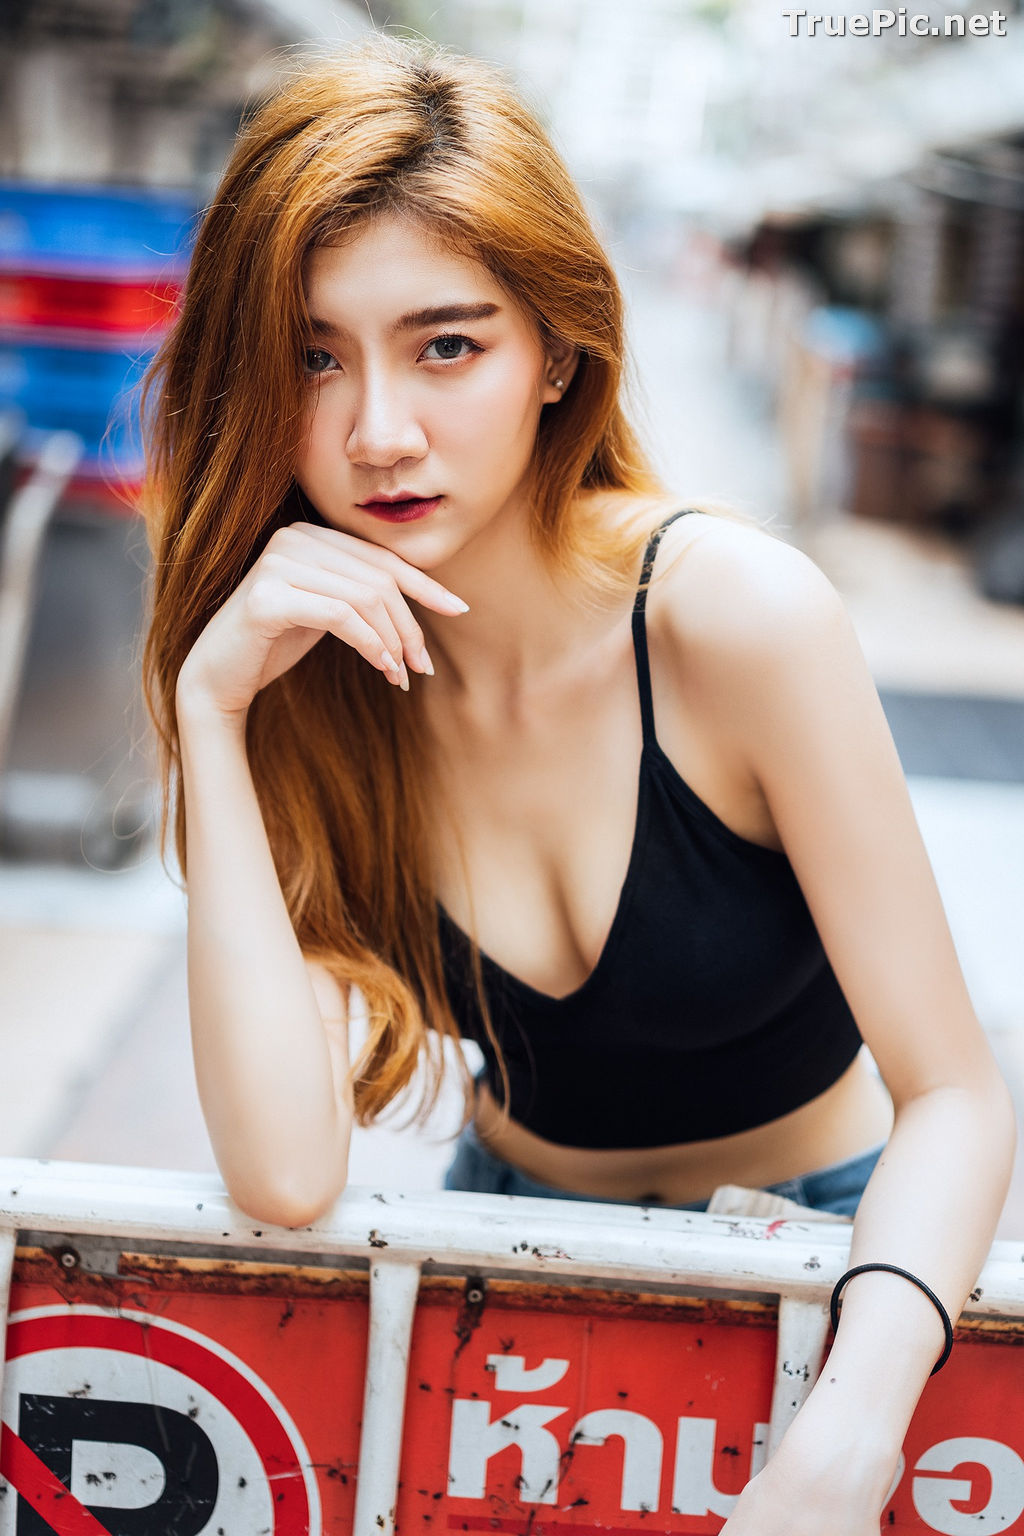 Image Thailand Model - Sasi Ngiunwan - Black Crop Tops and Jean - TruePic.net - Picture-6